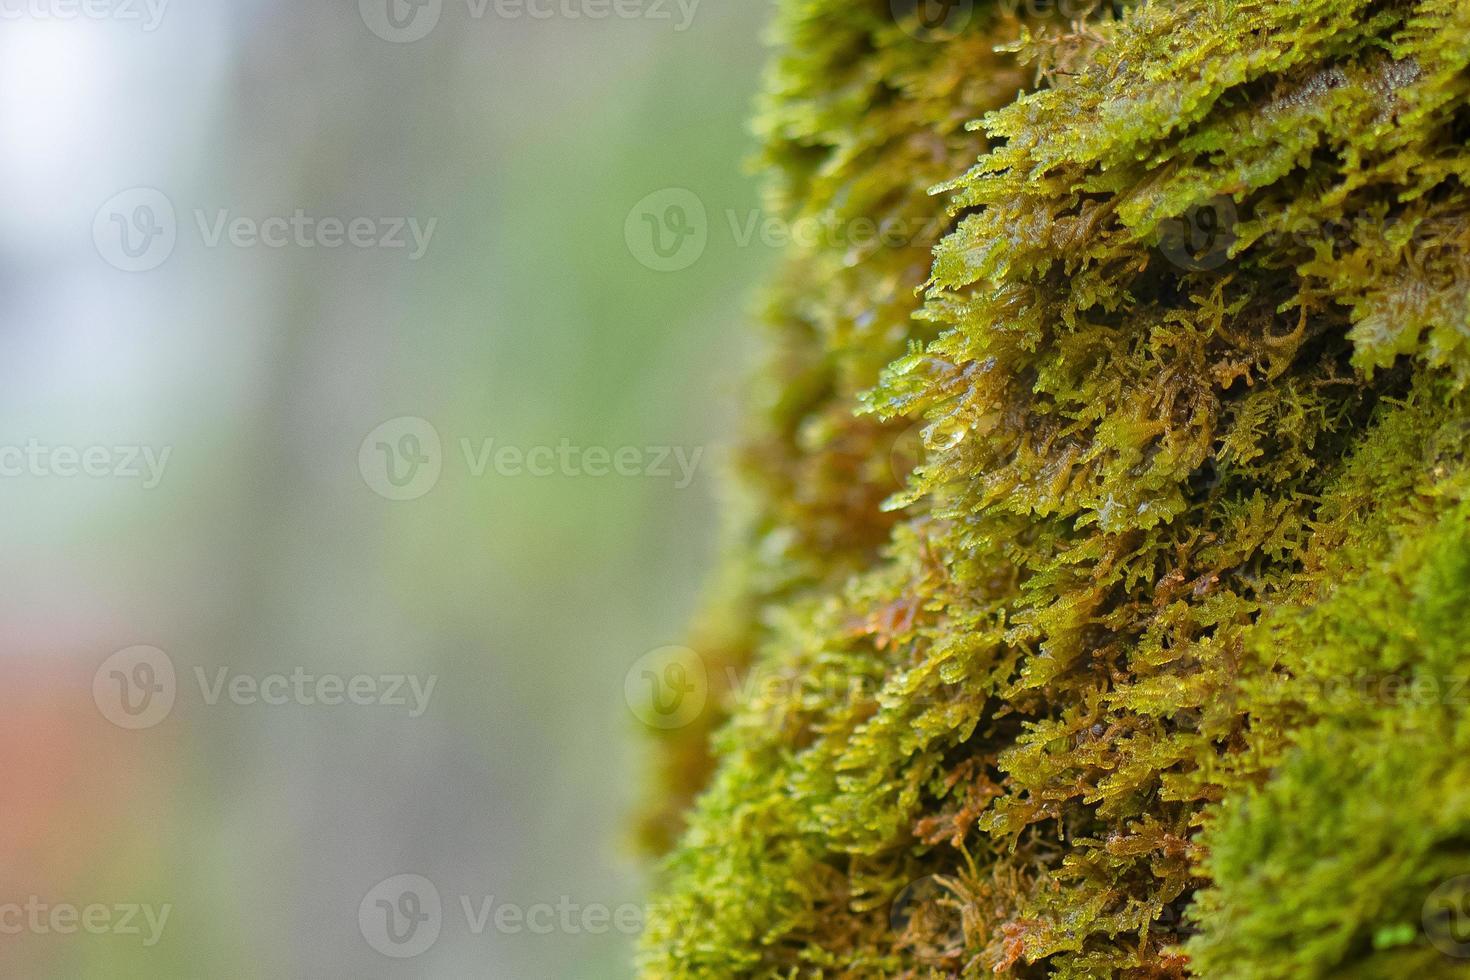 Detalle de musgo húmedo con fondo borroso foto